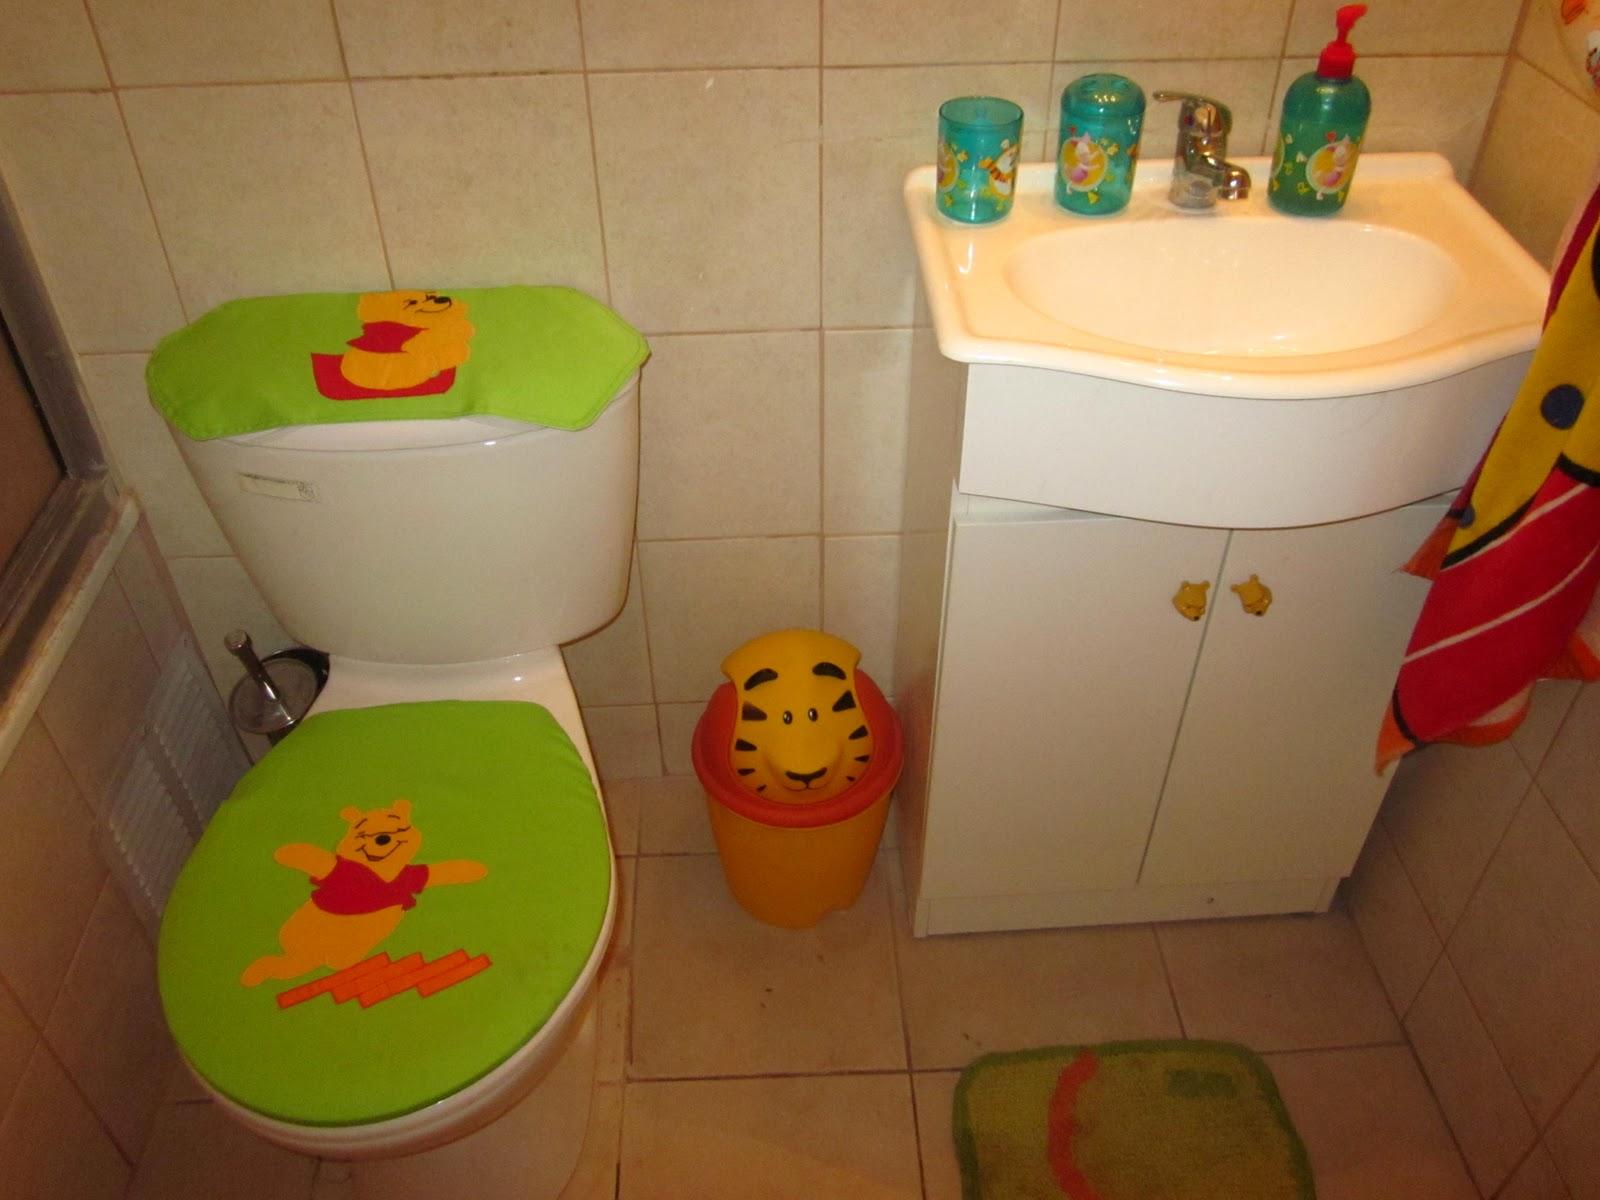 Cortina Baño Infantil:cortina de baño con aplicaciones de simsoms infantil